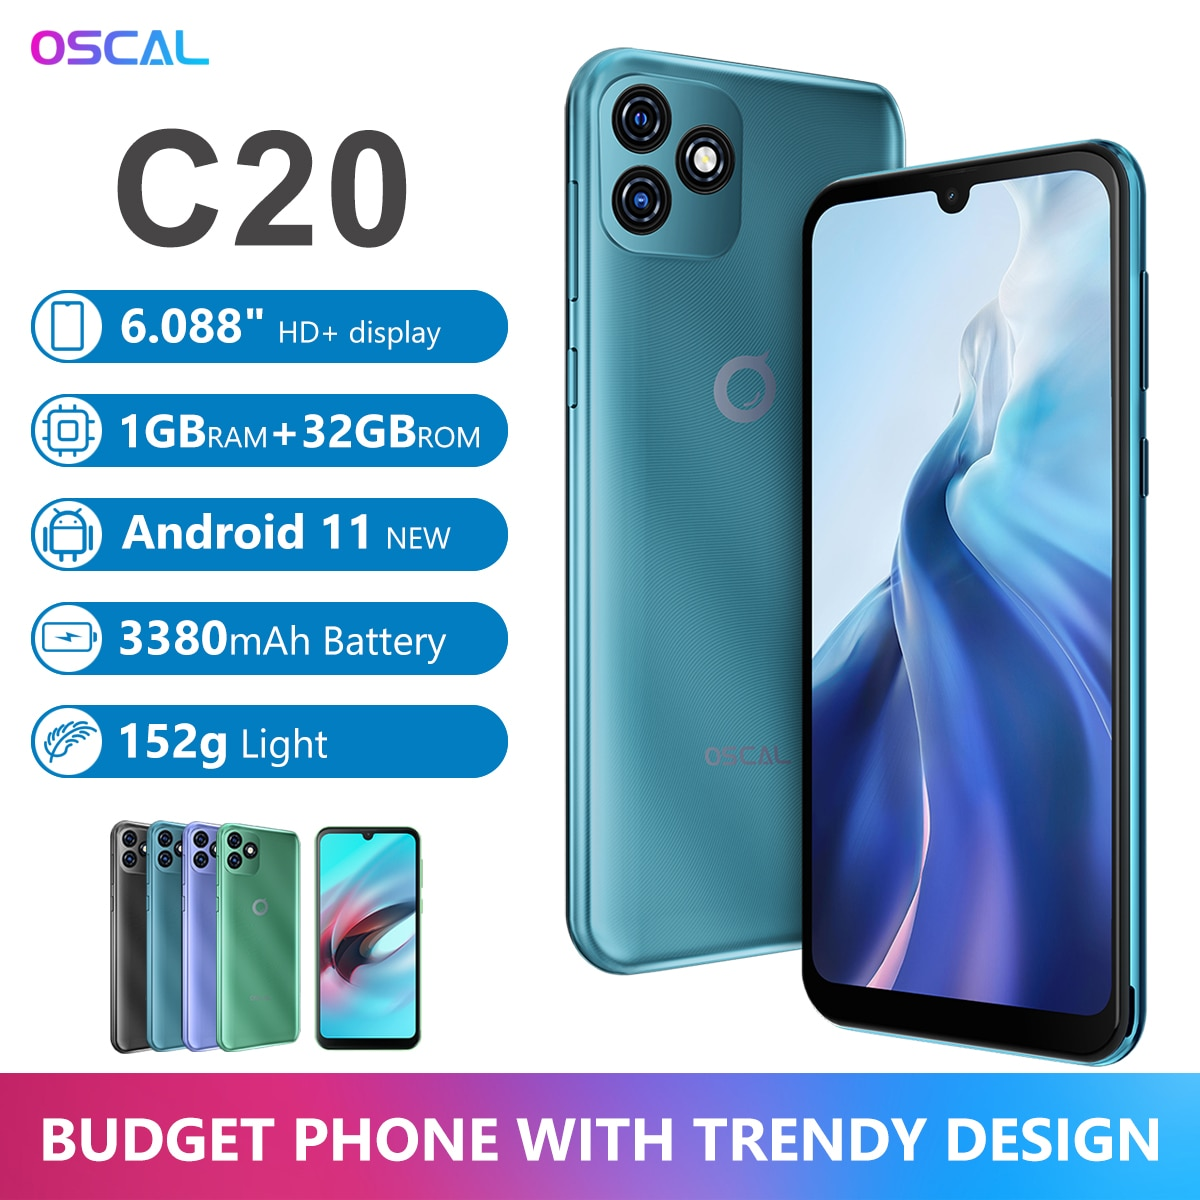 "BLACKVIEW OSCAL C20 Smartphone SC7731E Quad Core 1GB+32GB 6.088"" Screen 3380mAh Cellphone Dual Camera Android 11 3G Mobile Phone"